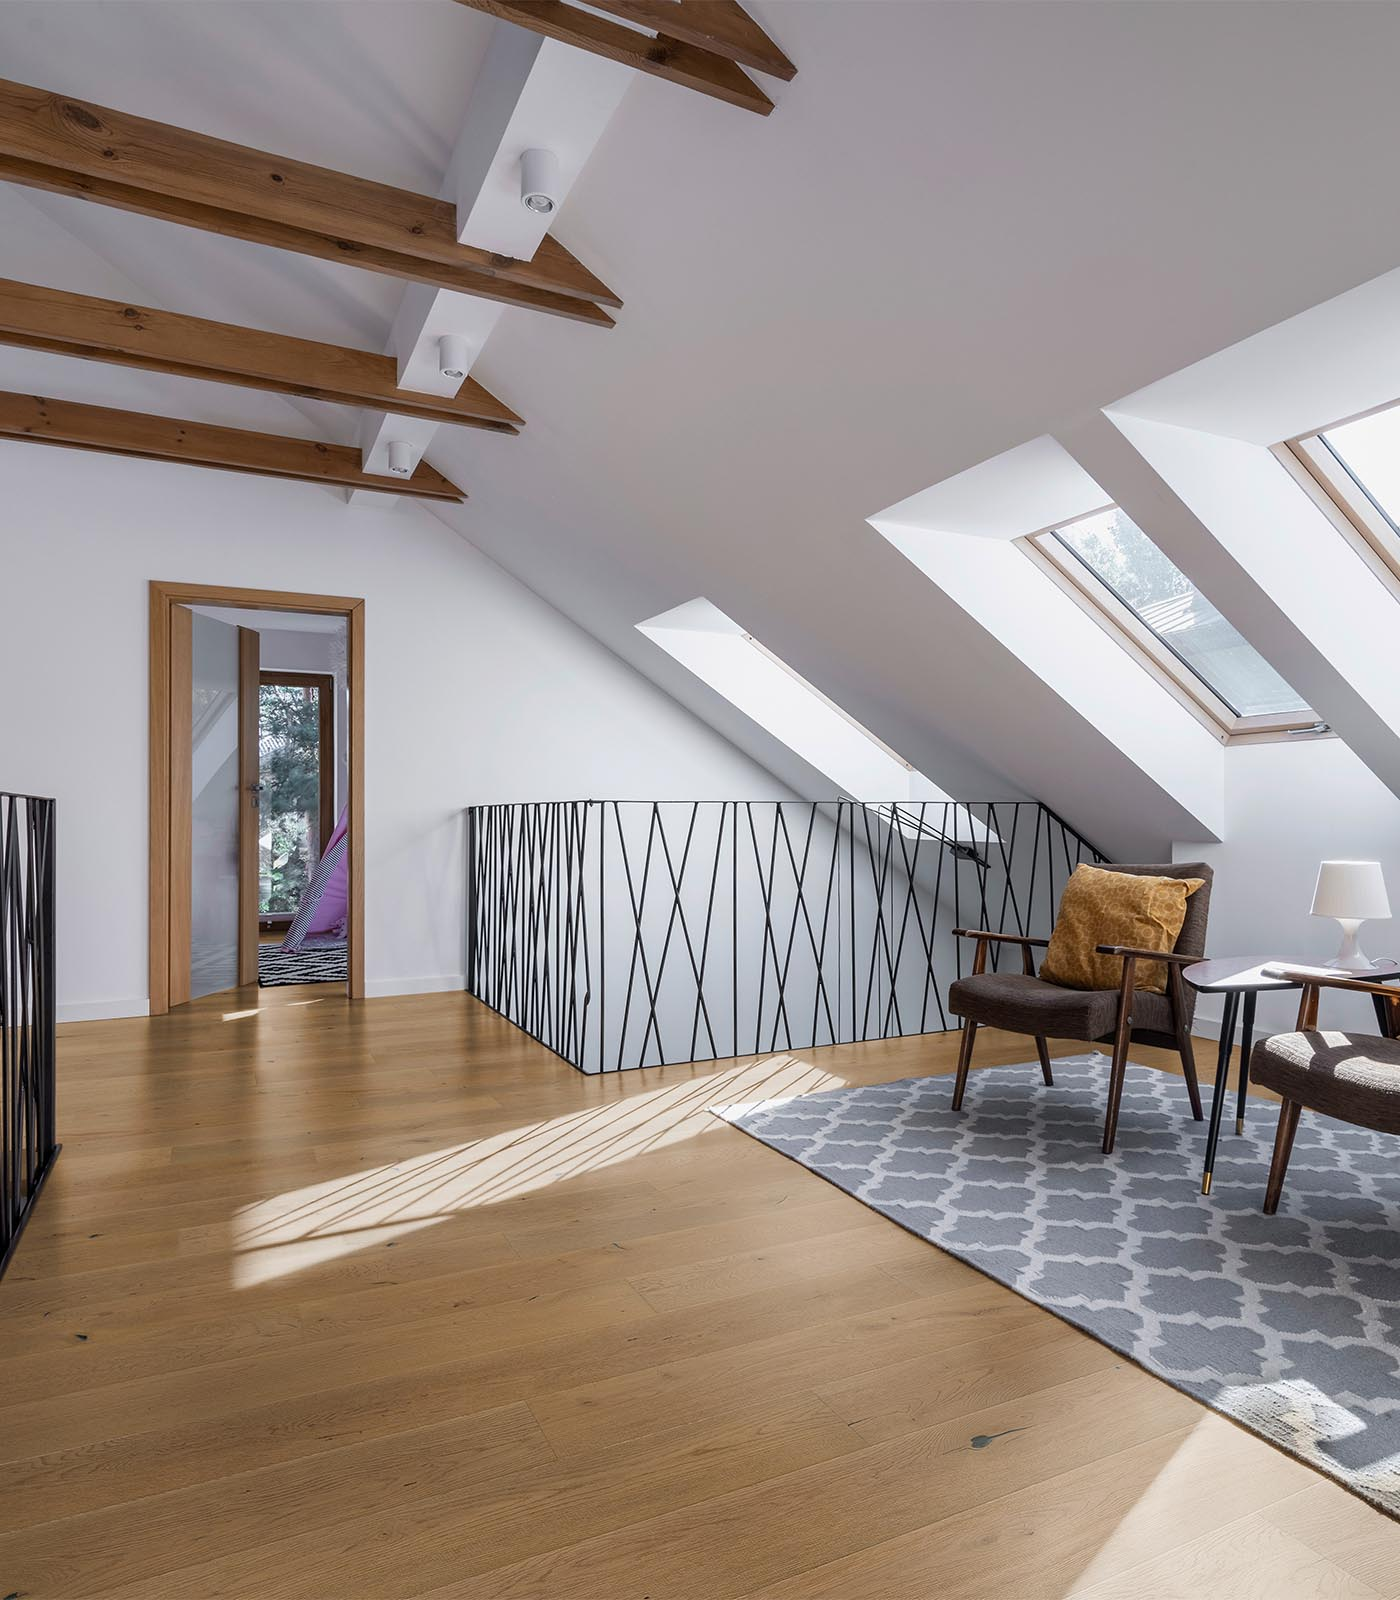 Modena-Heritage Collection-European oak flooring-room